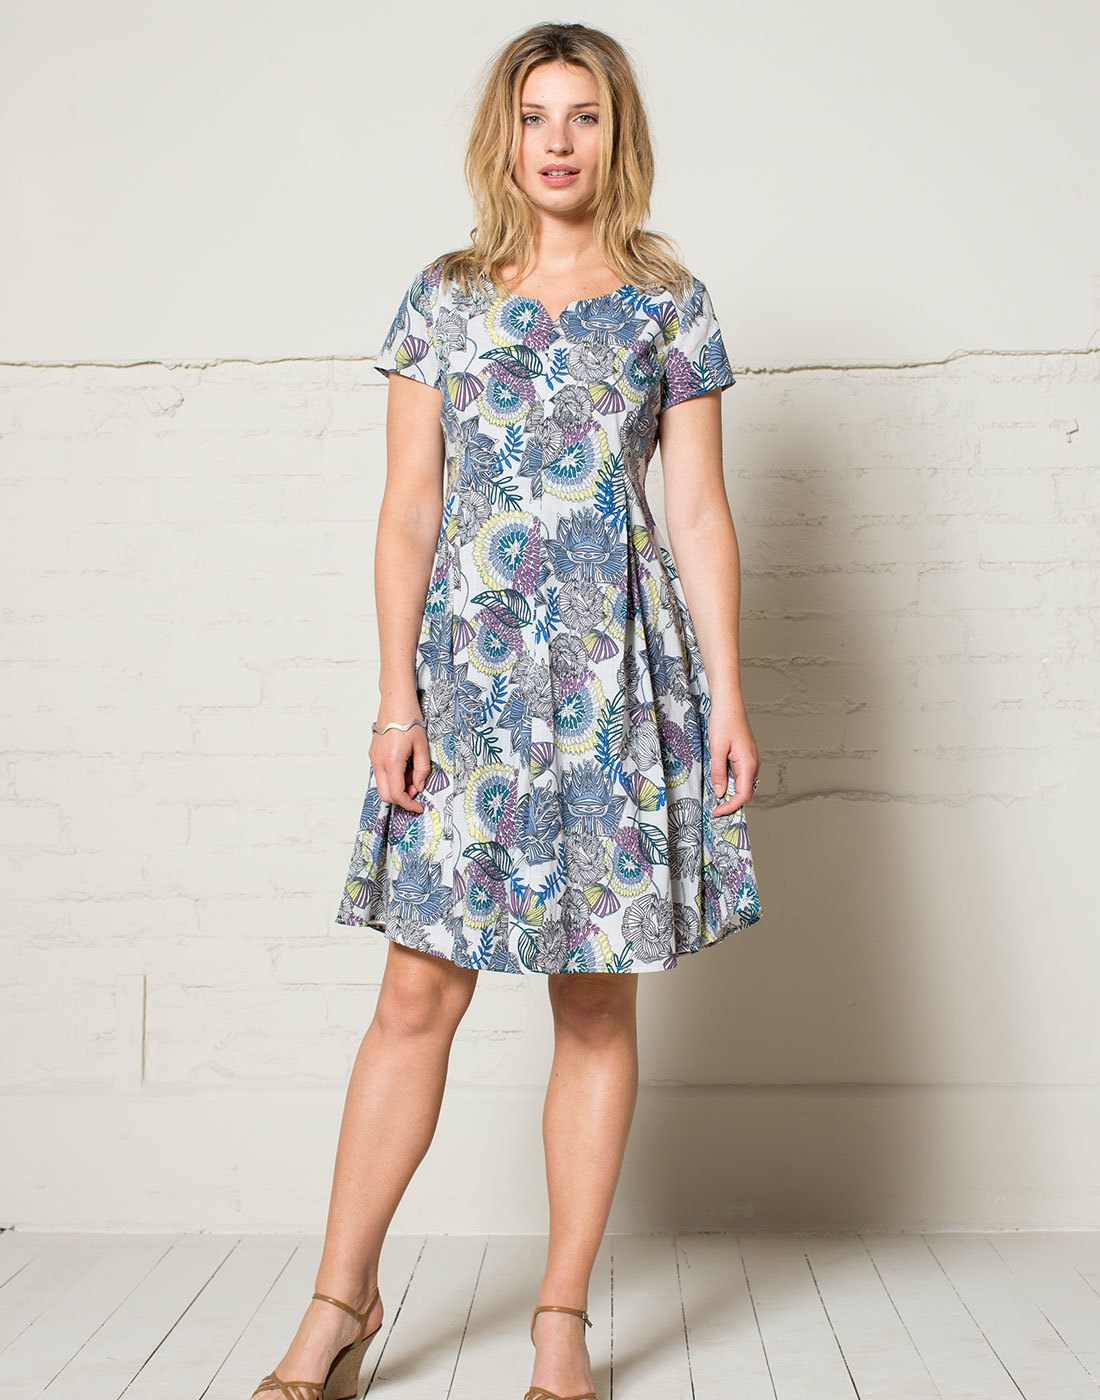 NOMADS Retro 50s Fair Trade Floral Boat Neck Dress